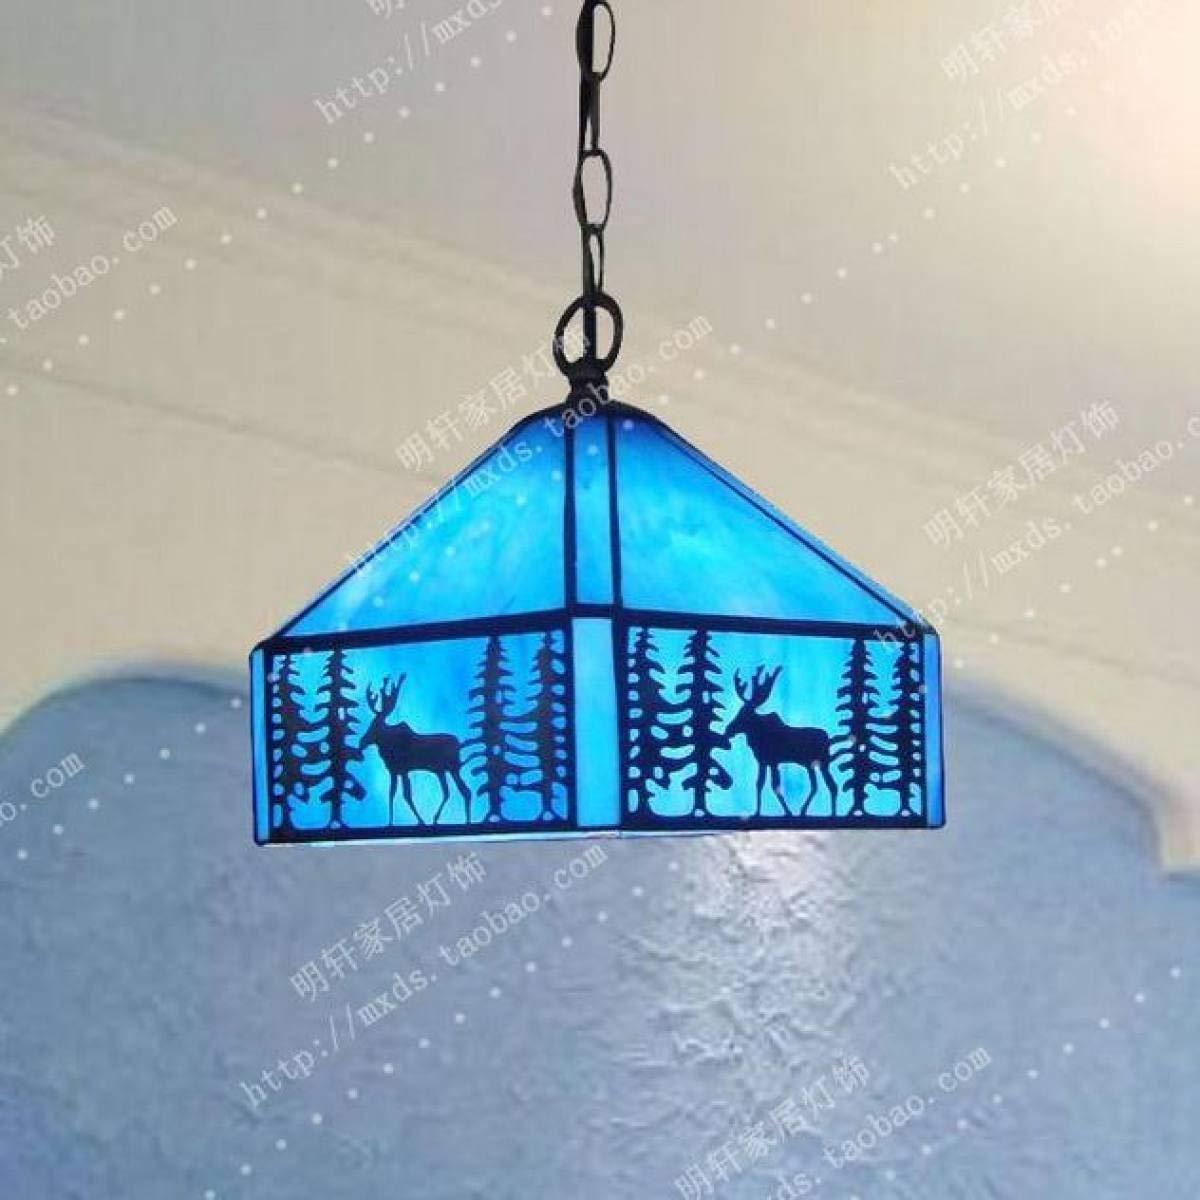 Eeayyygch Deckenleuchte Kronleuchter Creative Simple Classical Art Blau-20cm